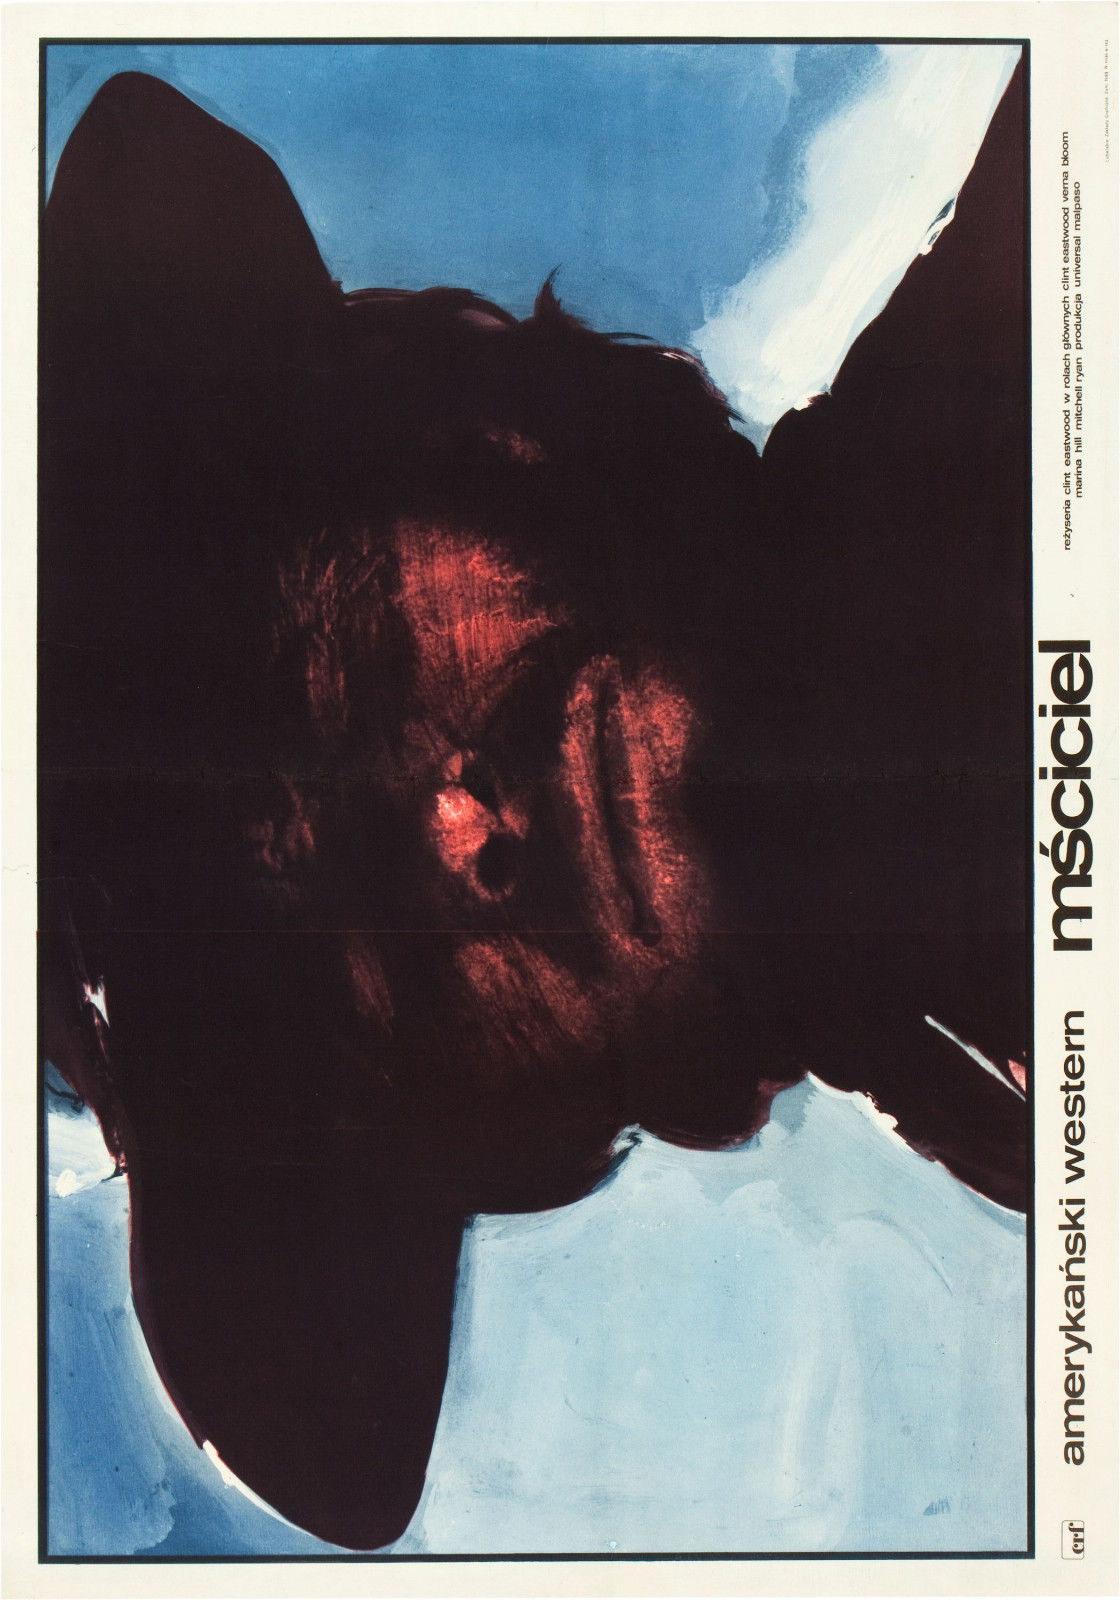 73103-HIGH-PLAINS-DRIFTER-Movie-Clint-Eastwood-Western-Wall-Print-Poster-Affiche